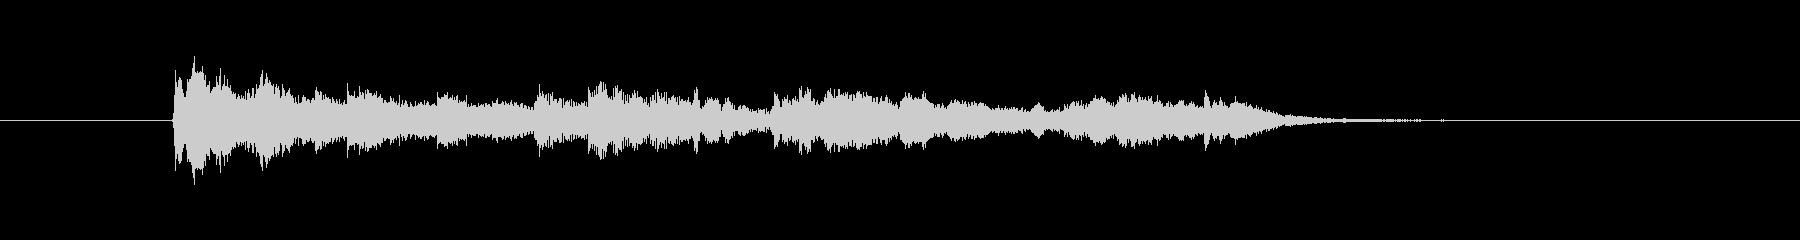 【MEゲーム 回復魔法】シュワンシュワンの未再生の波形